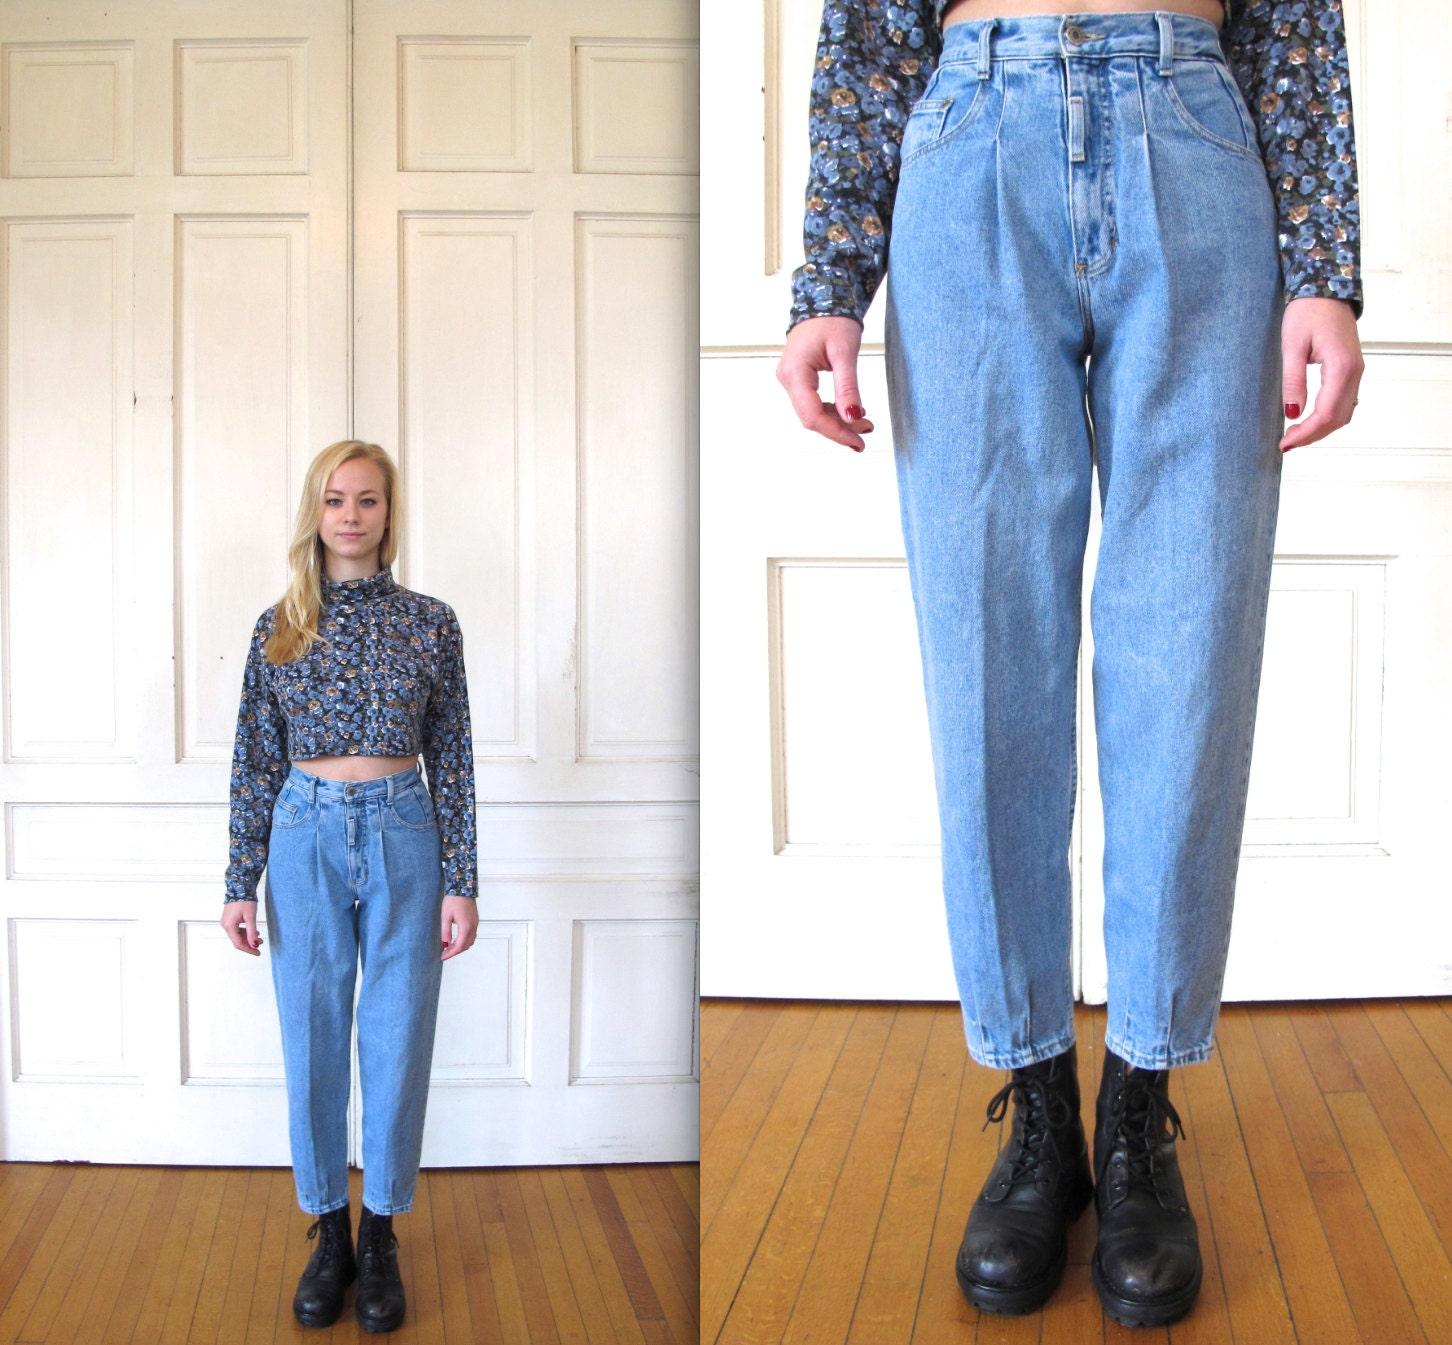 Vtg 90s High Waisted Stone Wash Blue Jeans / Light Blue